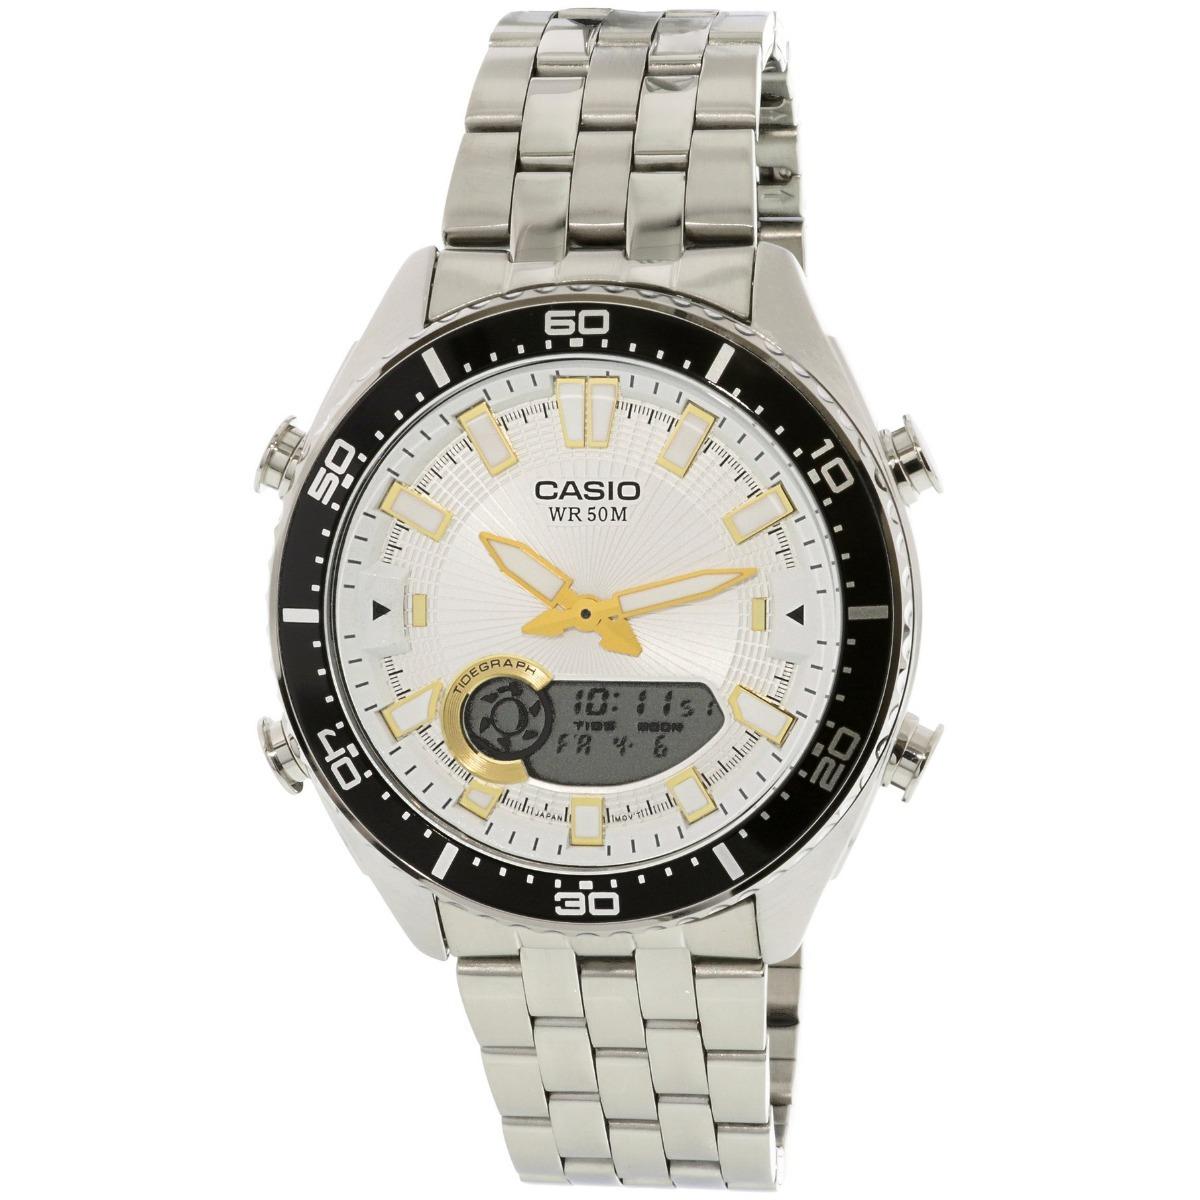 Digi 00 Reloj Casio Libre Lujo En Mercado Ana Oferta1 799 De